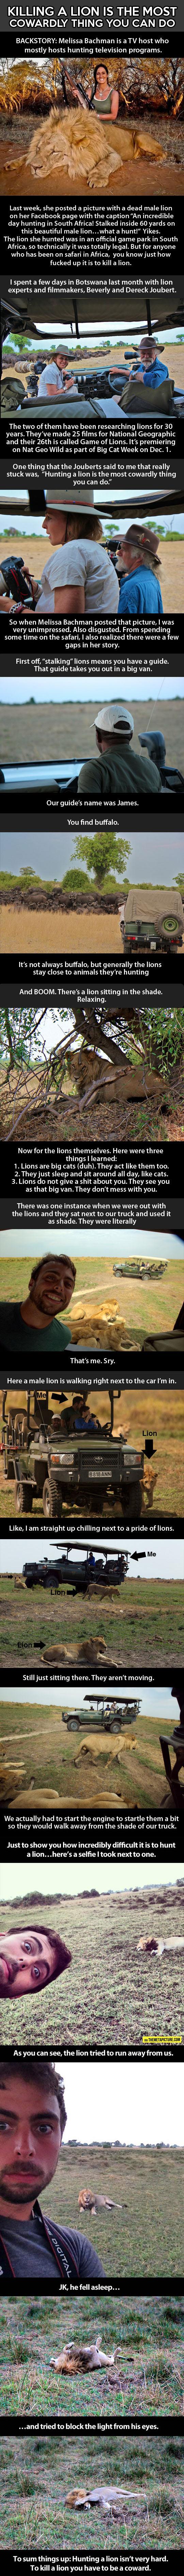 animals-lion-host-hunter-Africa-gun-Bachman